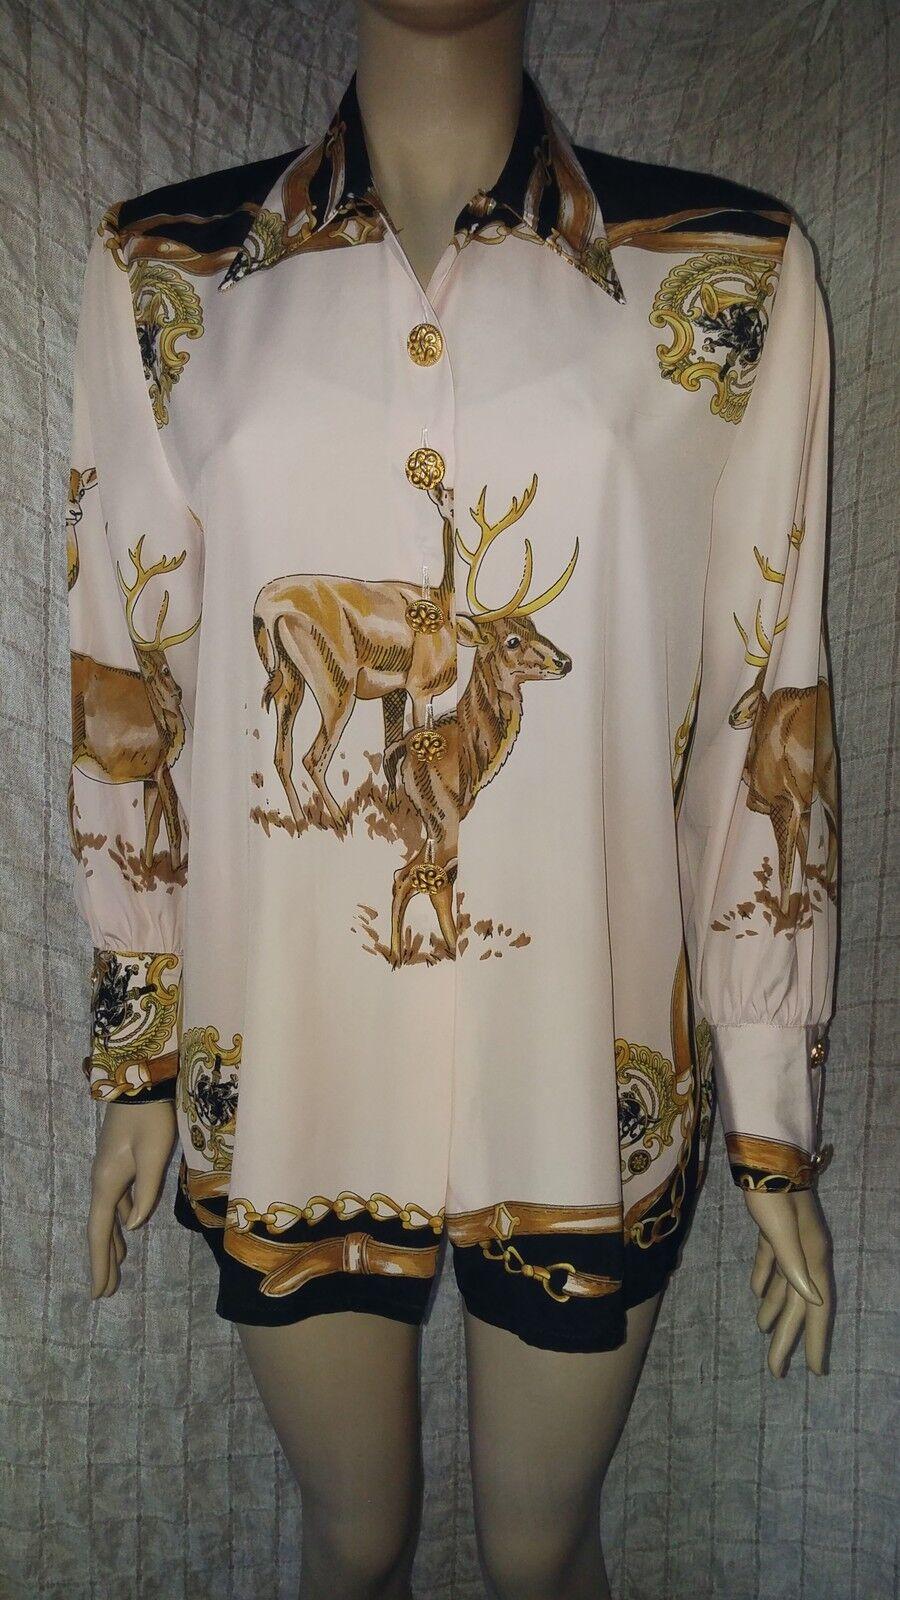 Sandro vintage 100% viscose silky gazelle printed unique shirt Größe L